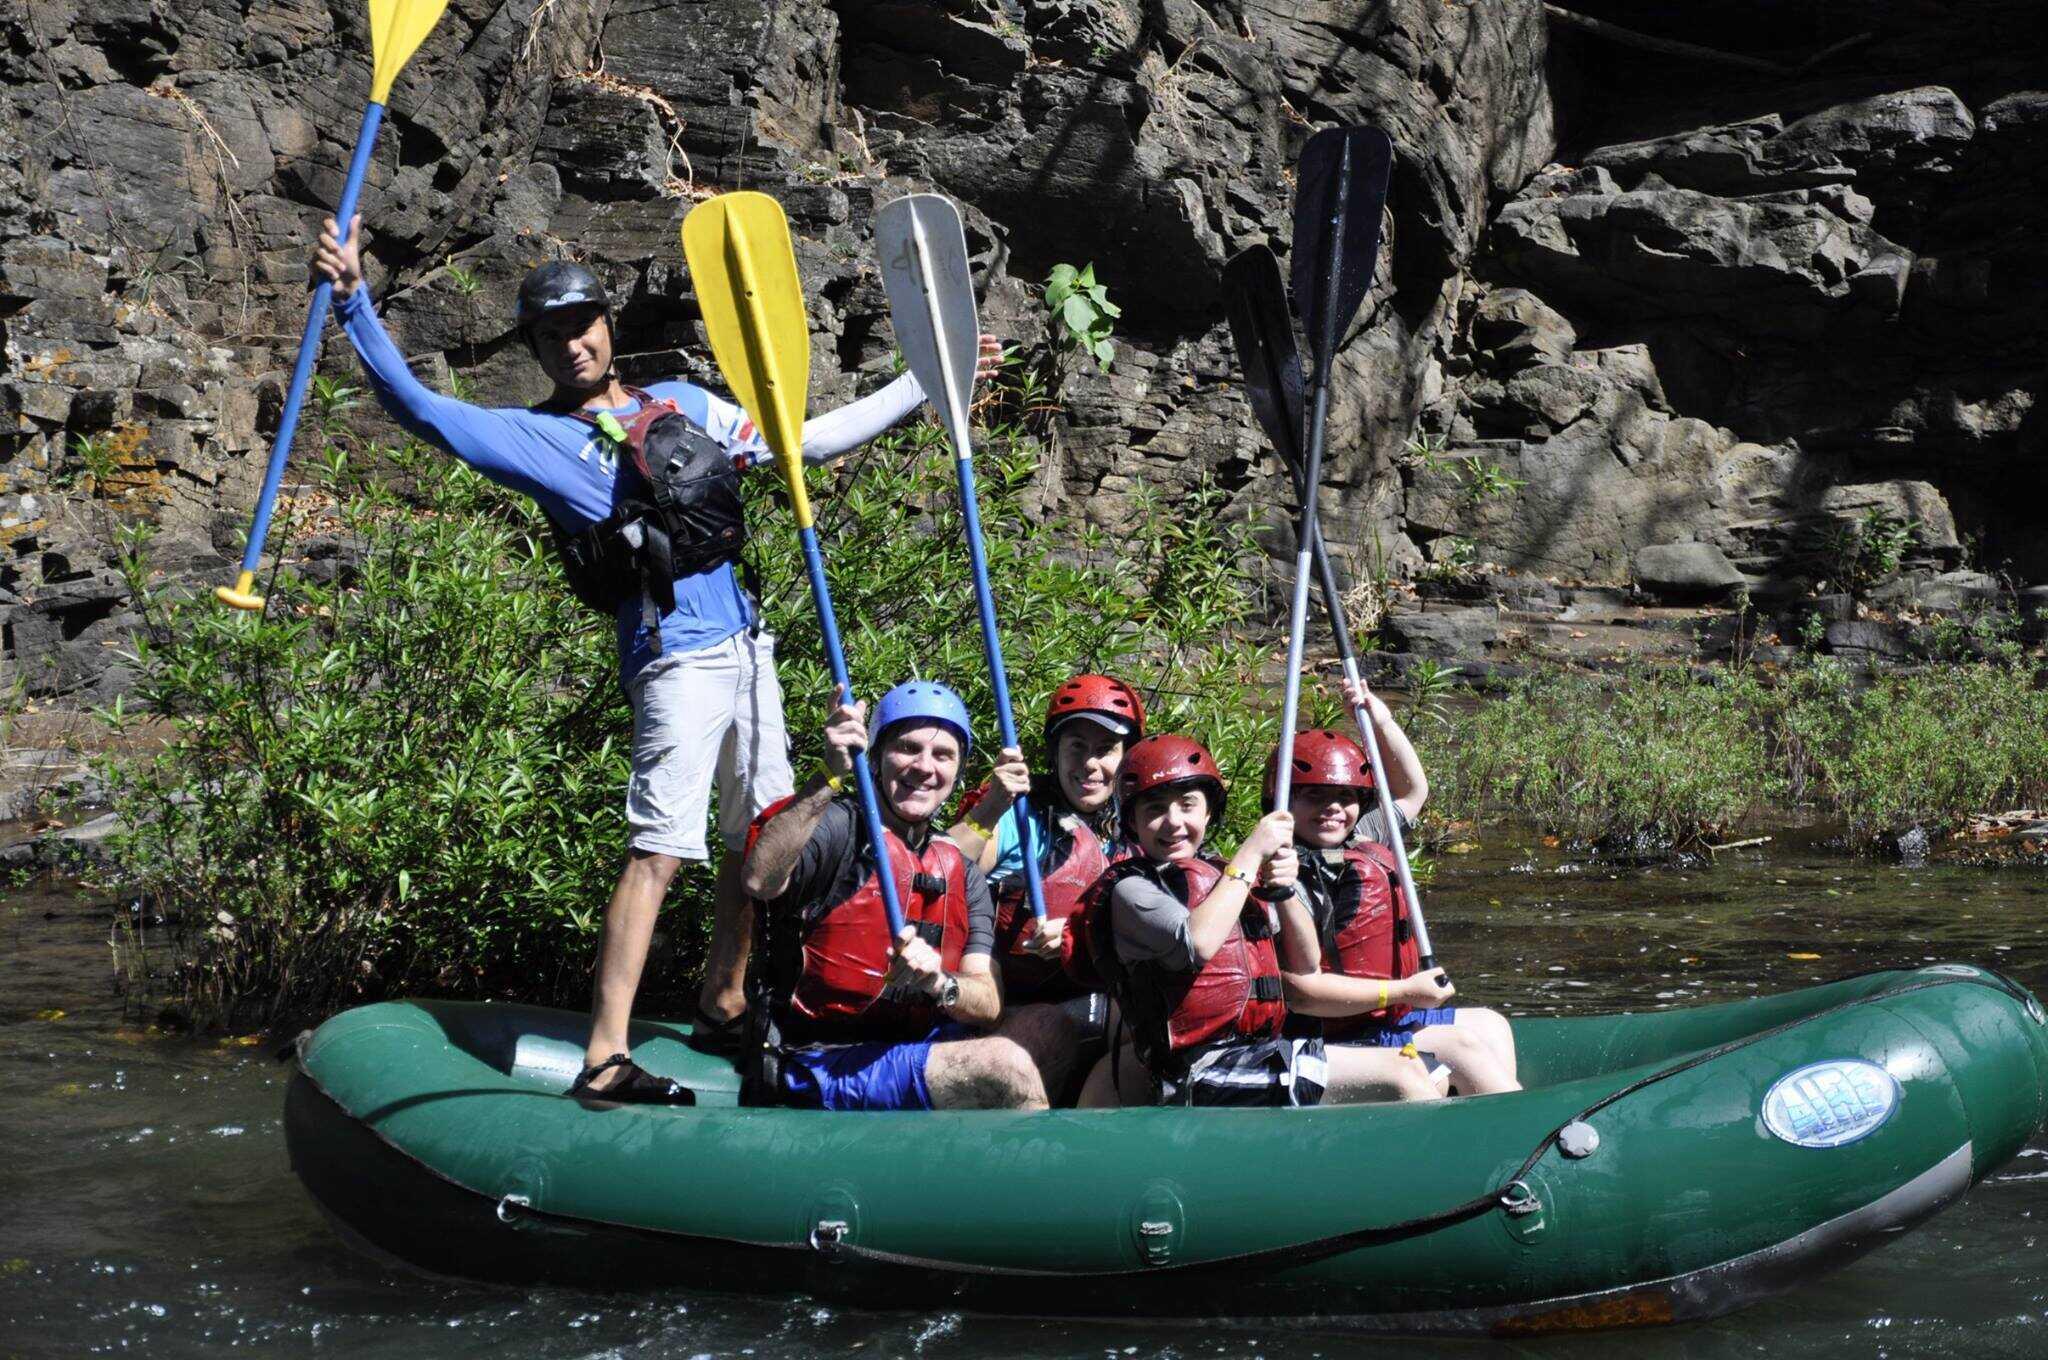 Rafting in Guanacaste with Tenorio Adventure Company.